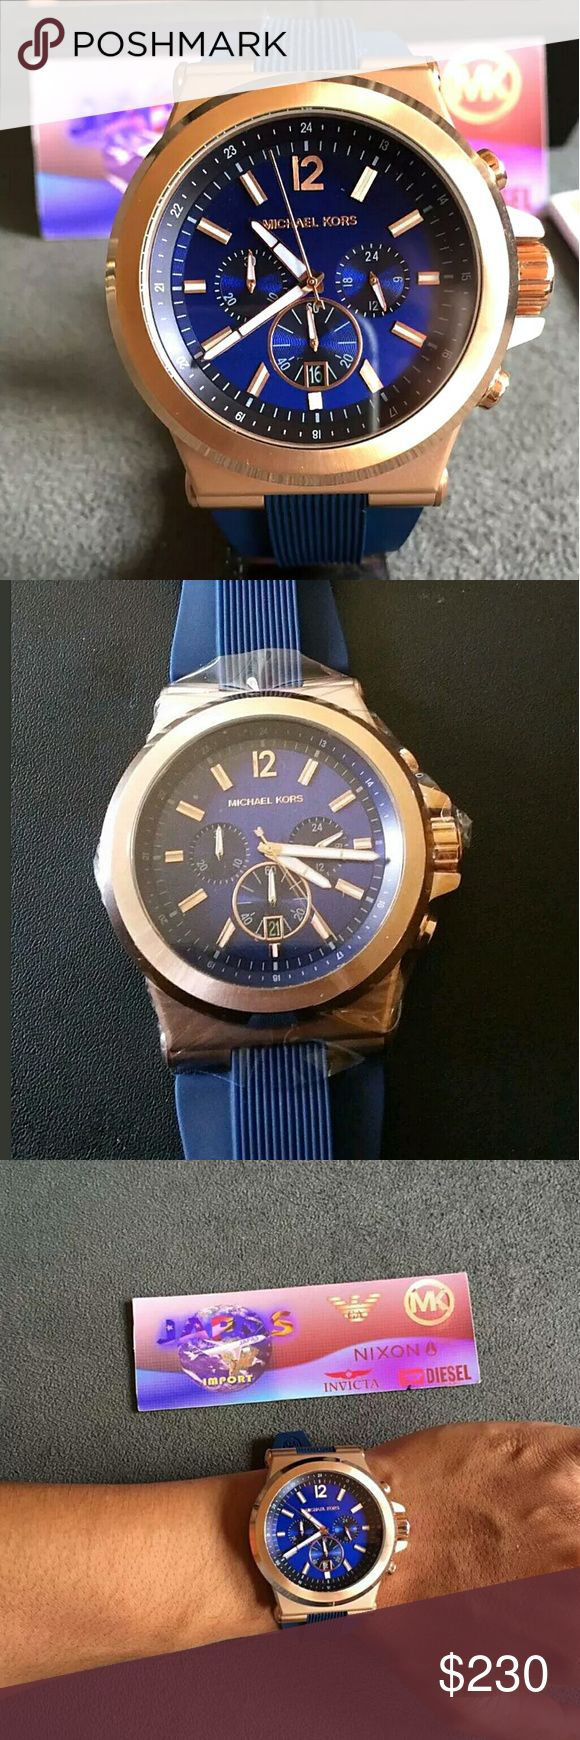 authentic michael kors outlet online store michael kors watch box